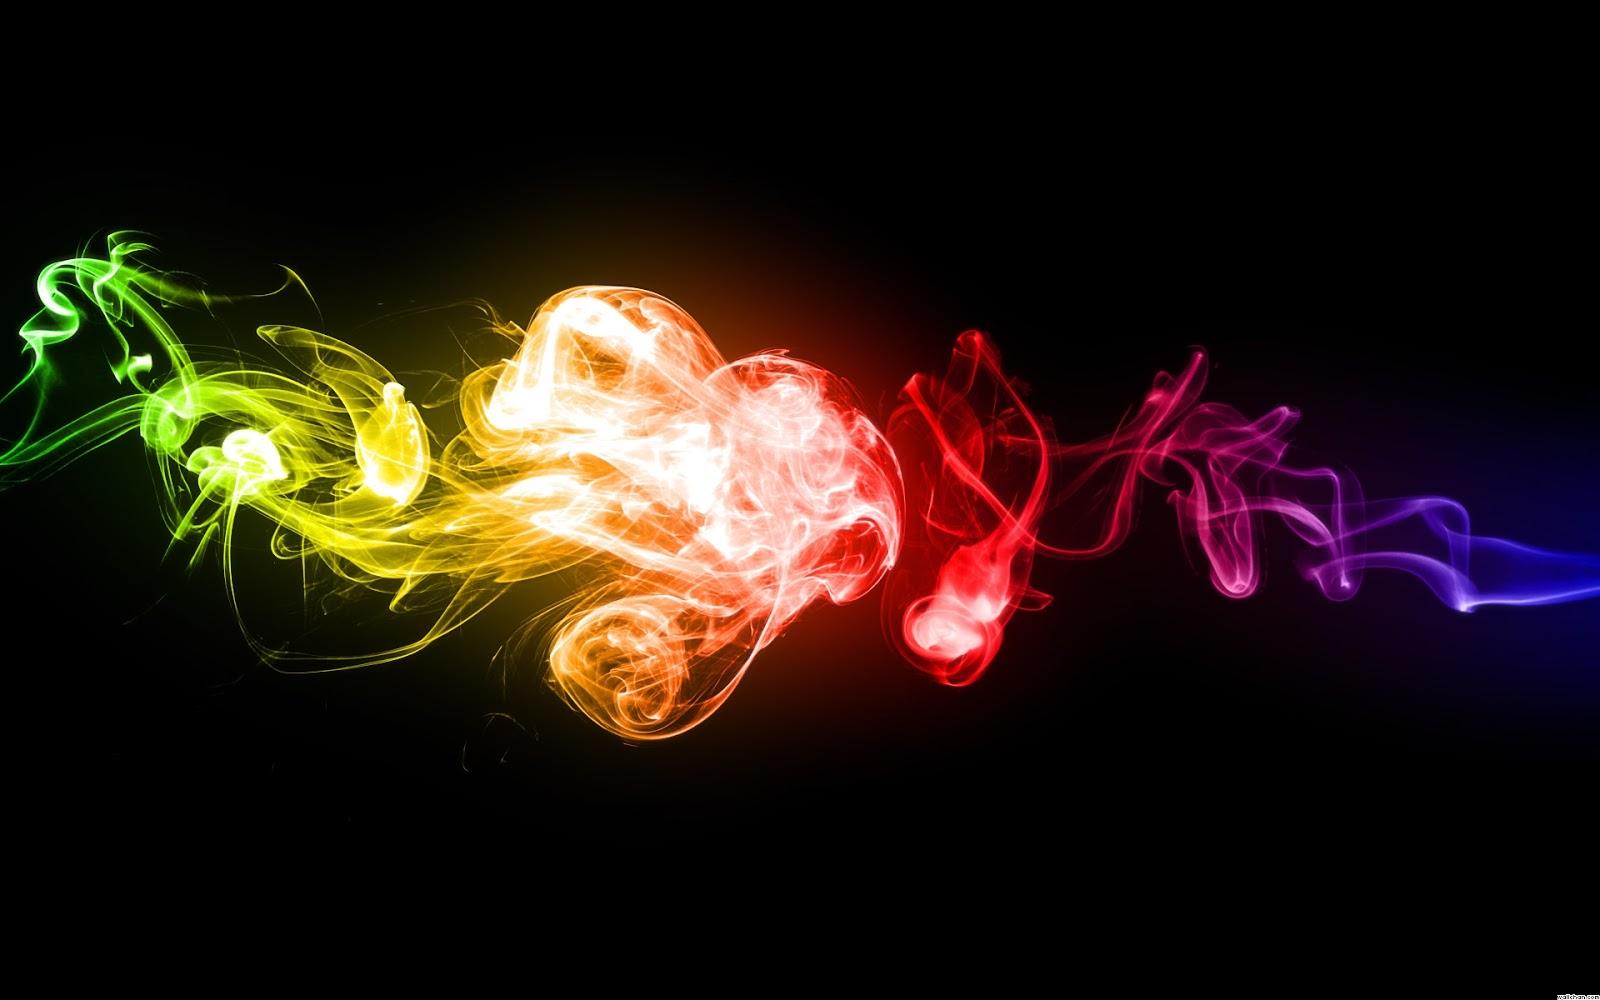 http://2.bp.blogspot.com/-zeFR4sqOD88/UJQi1eYjyvI/AAAAAAAAZcw/zISCyseVil0/s1600/Rainbow-Colors-Wallpaper-wallpapers-28469153-1920-1200.jpg